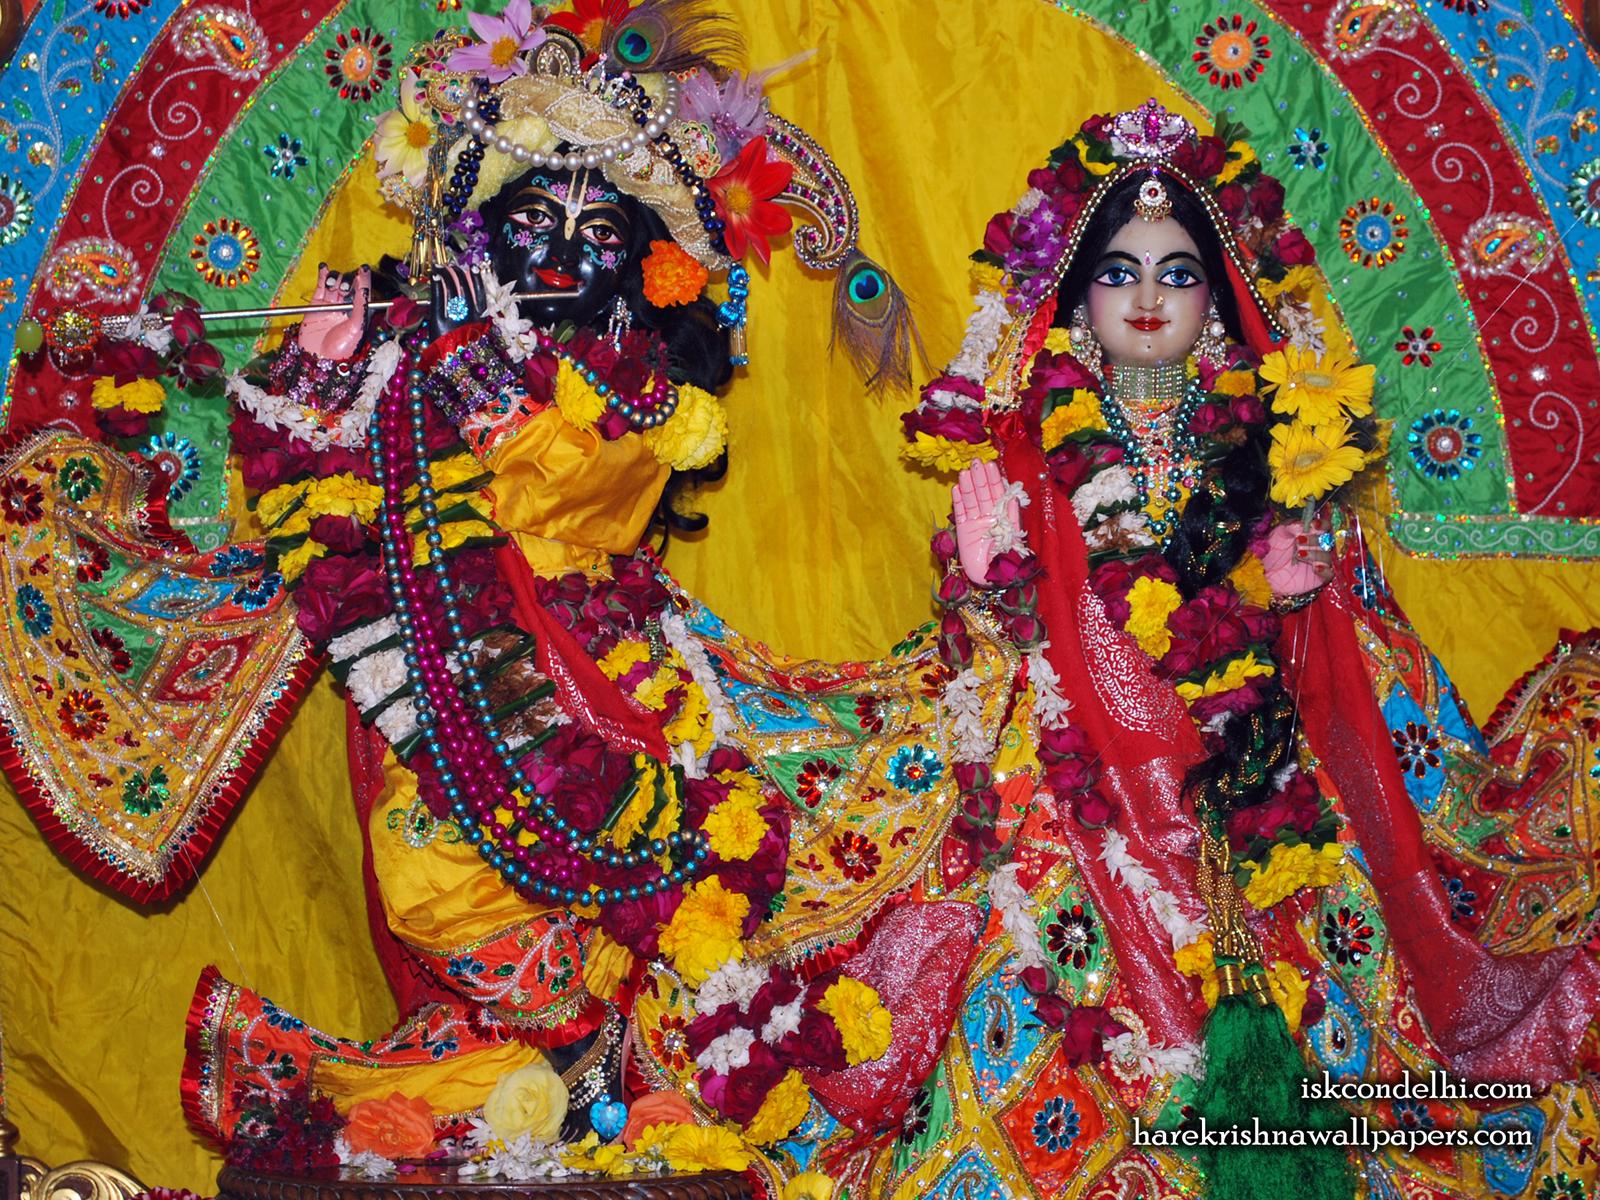 Sri Sri Radha Parthasarathi Wallpaper (011) Size1600x1200 Download